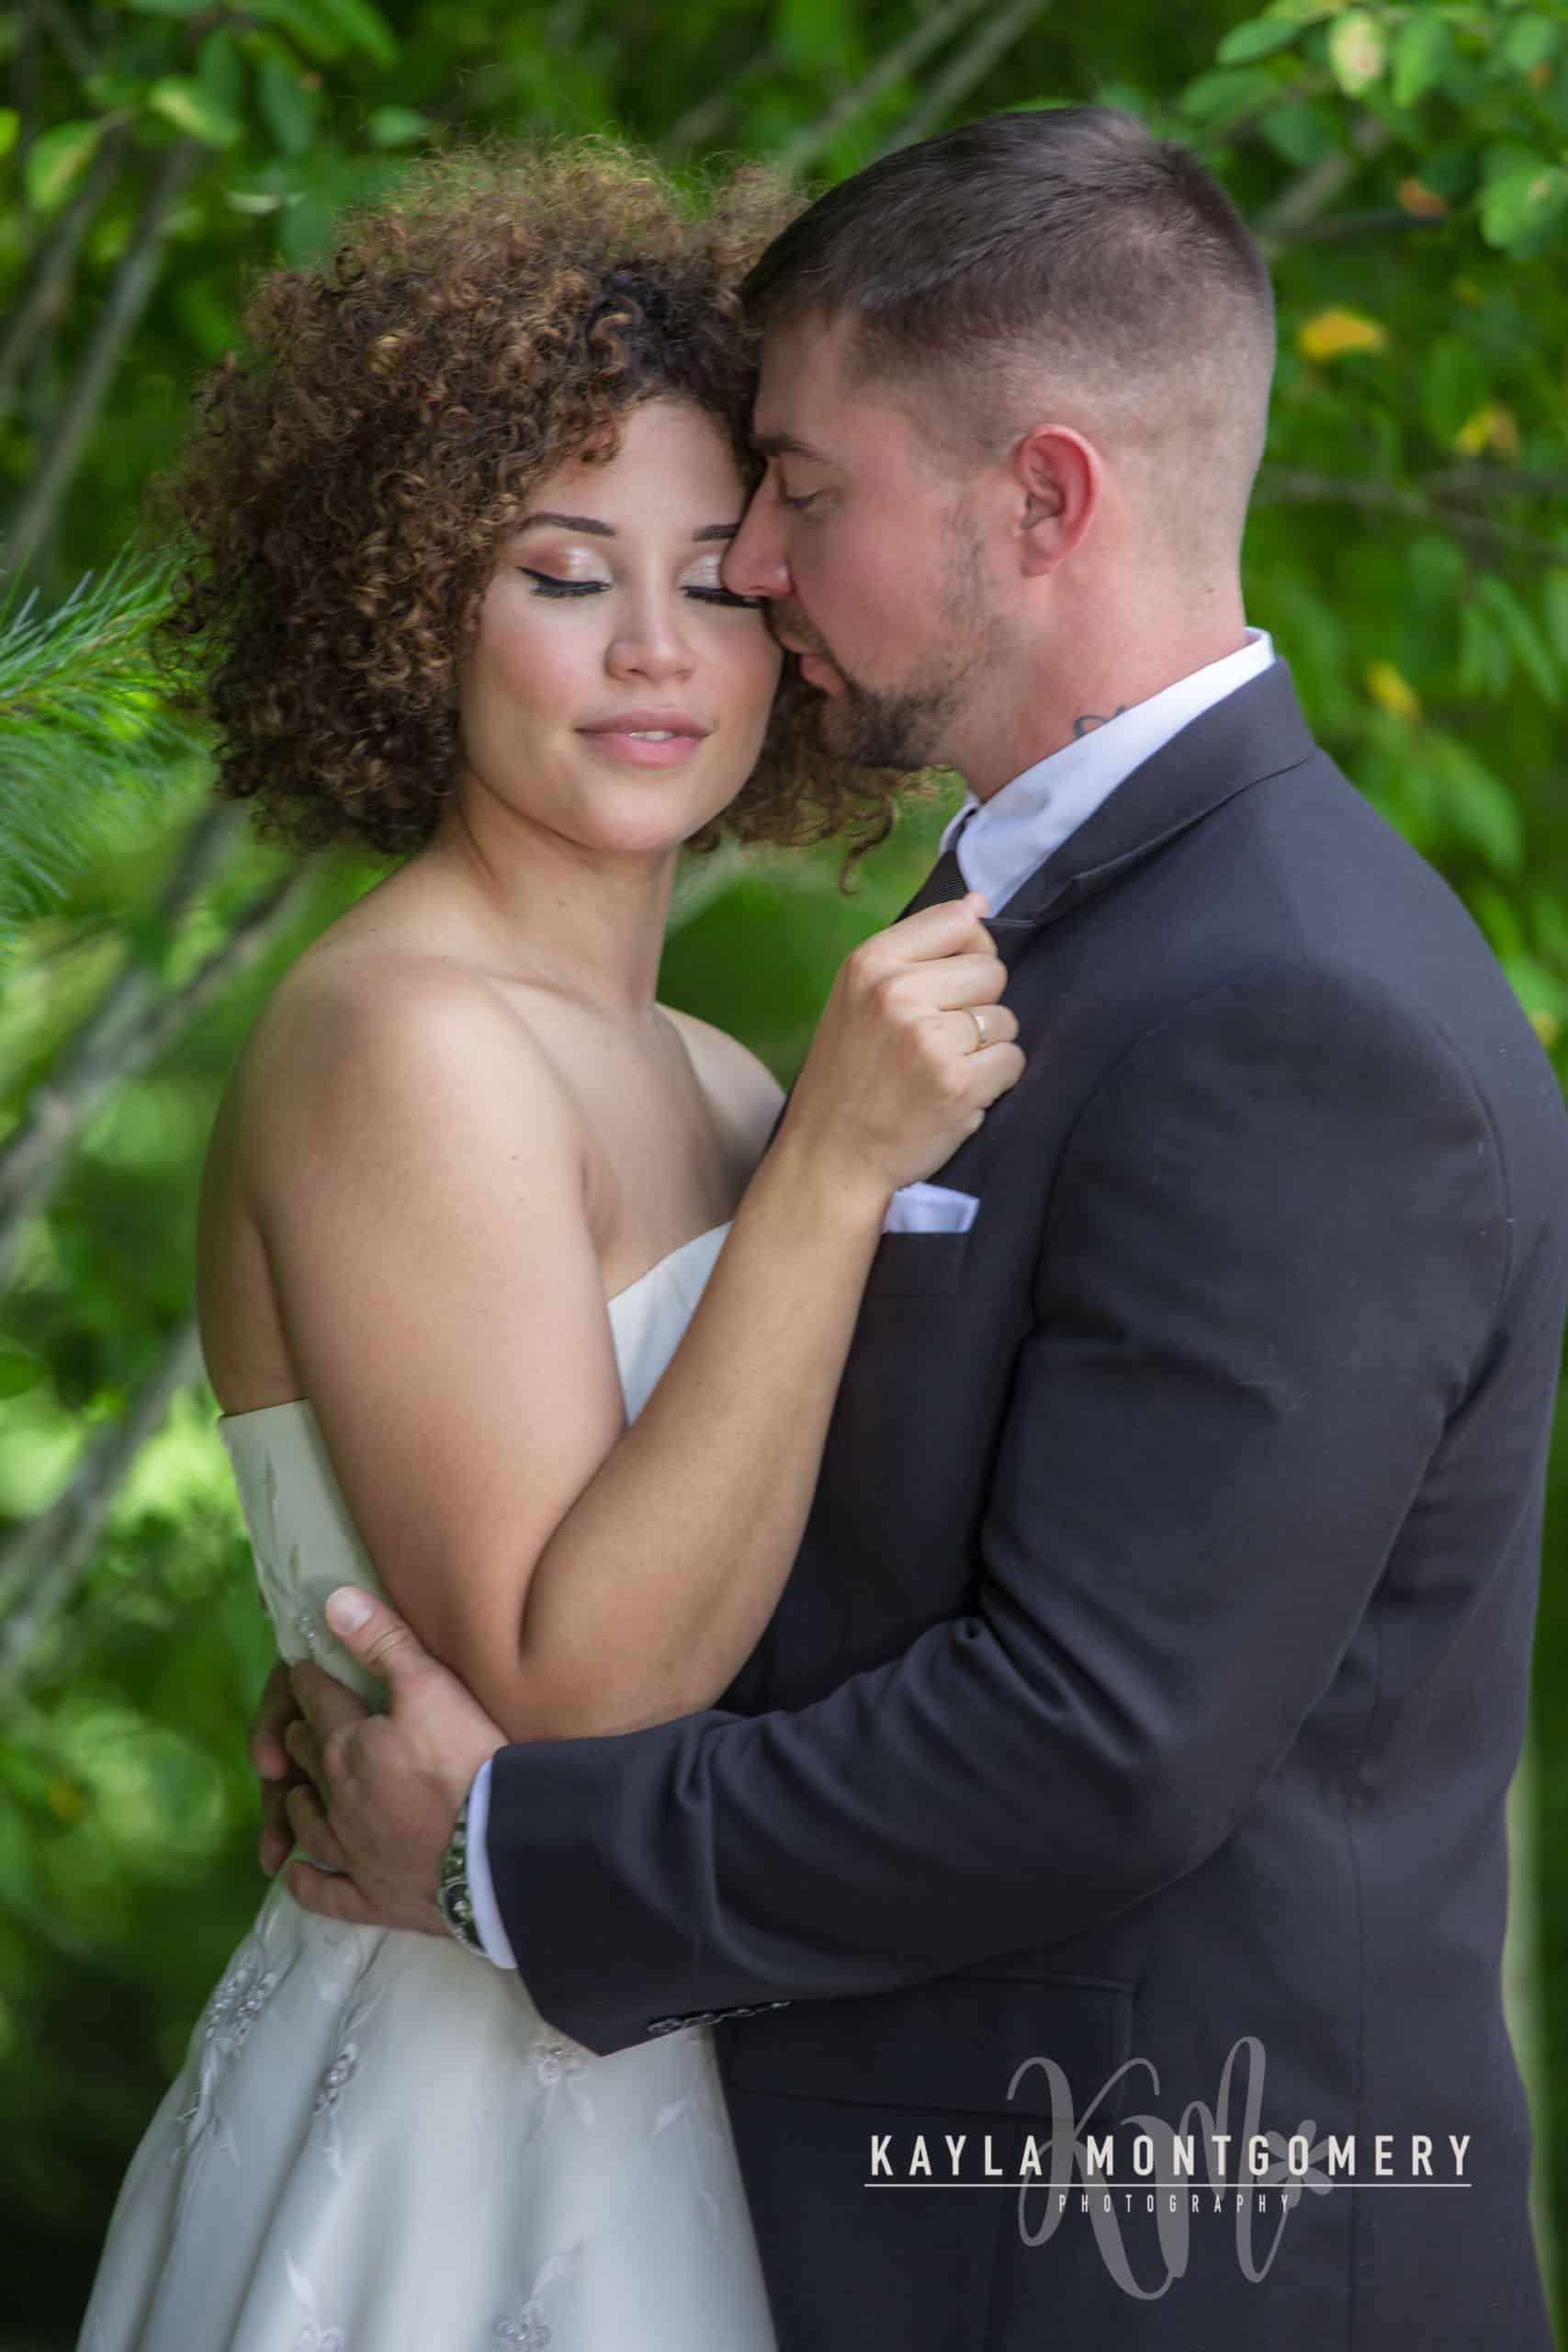 Photography Program, Wedding Photography